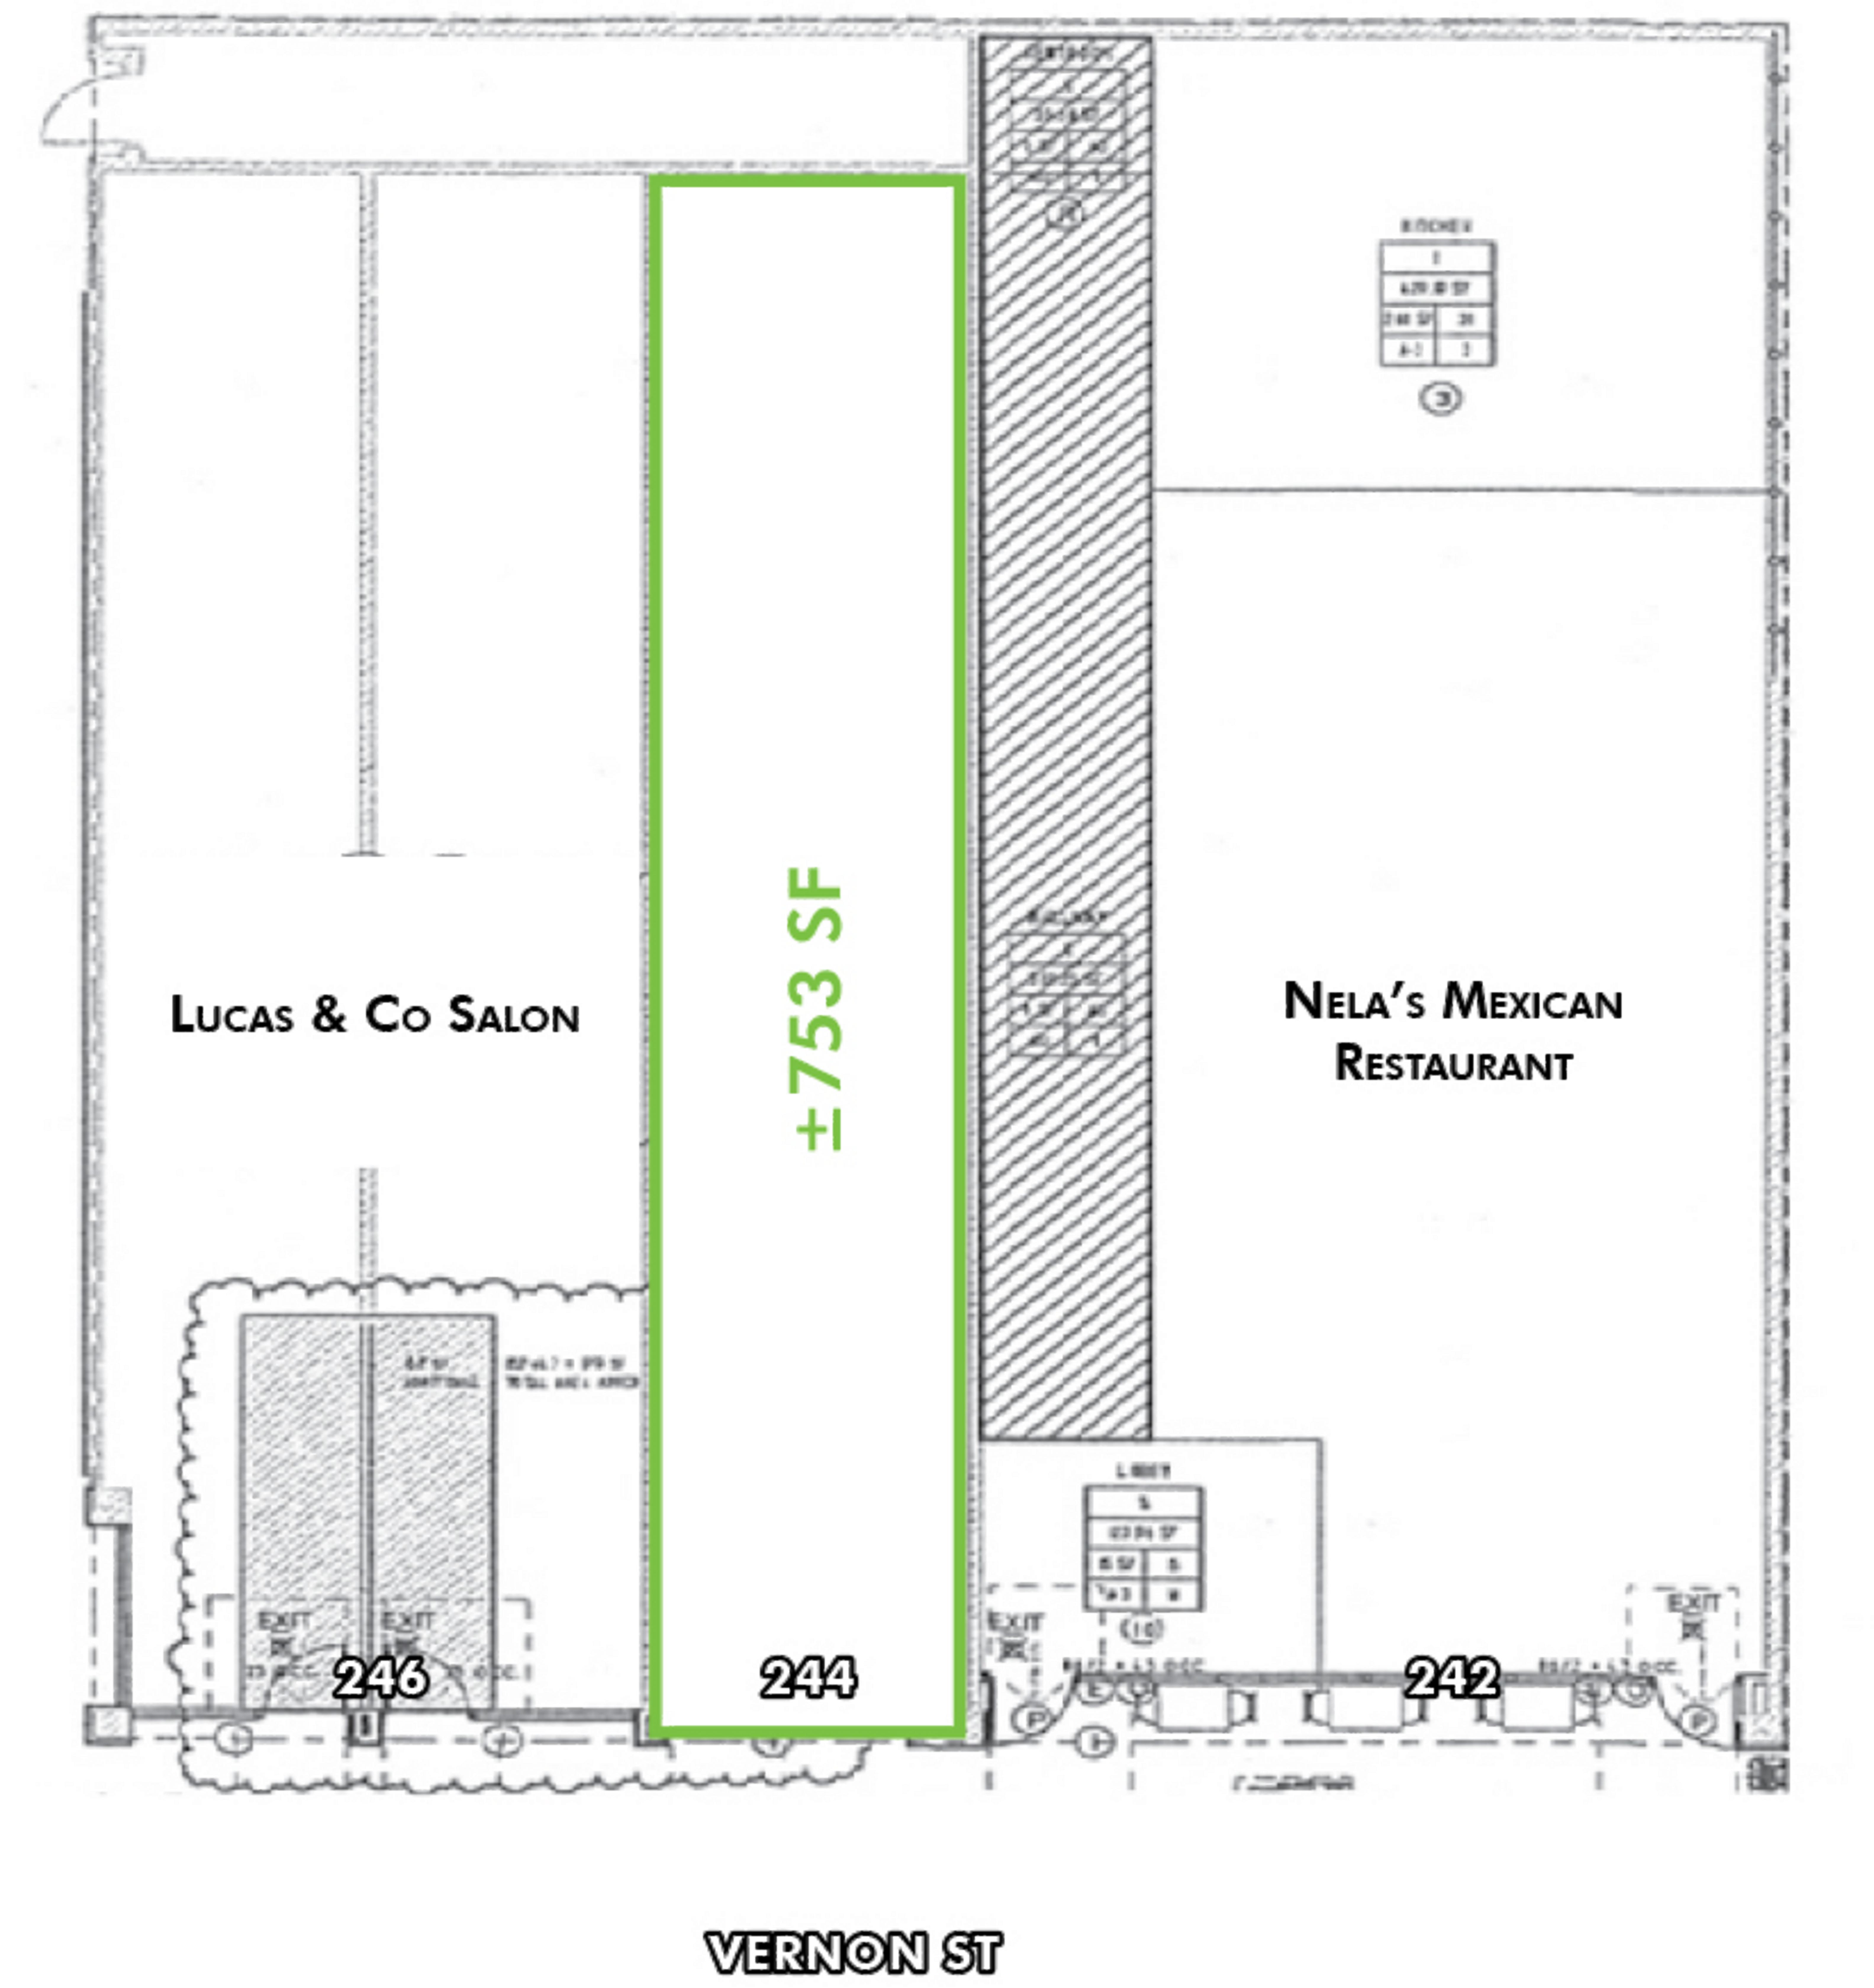 244 Vernon Street: site plan